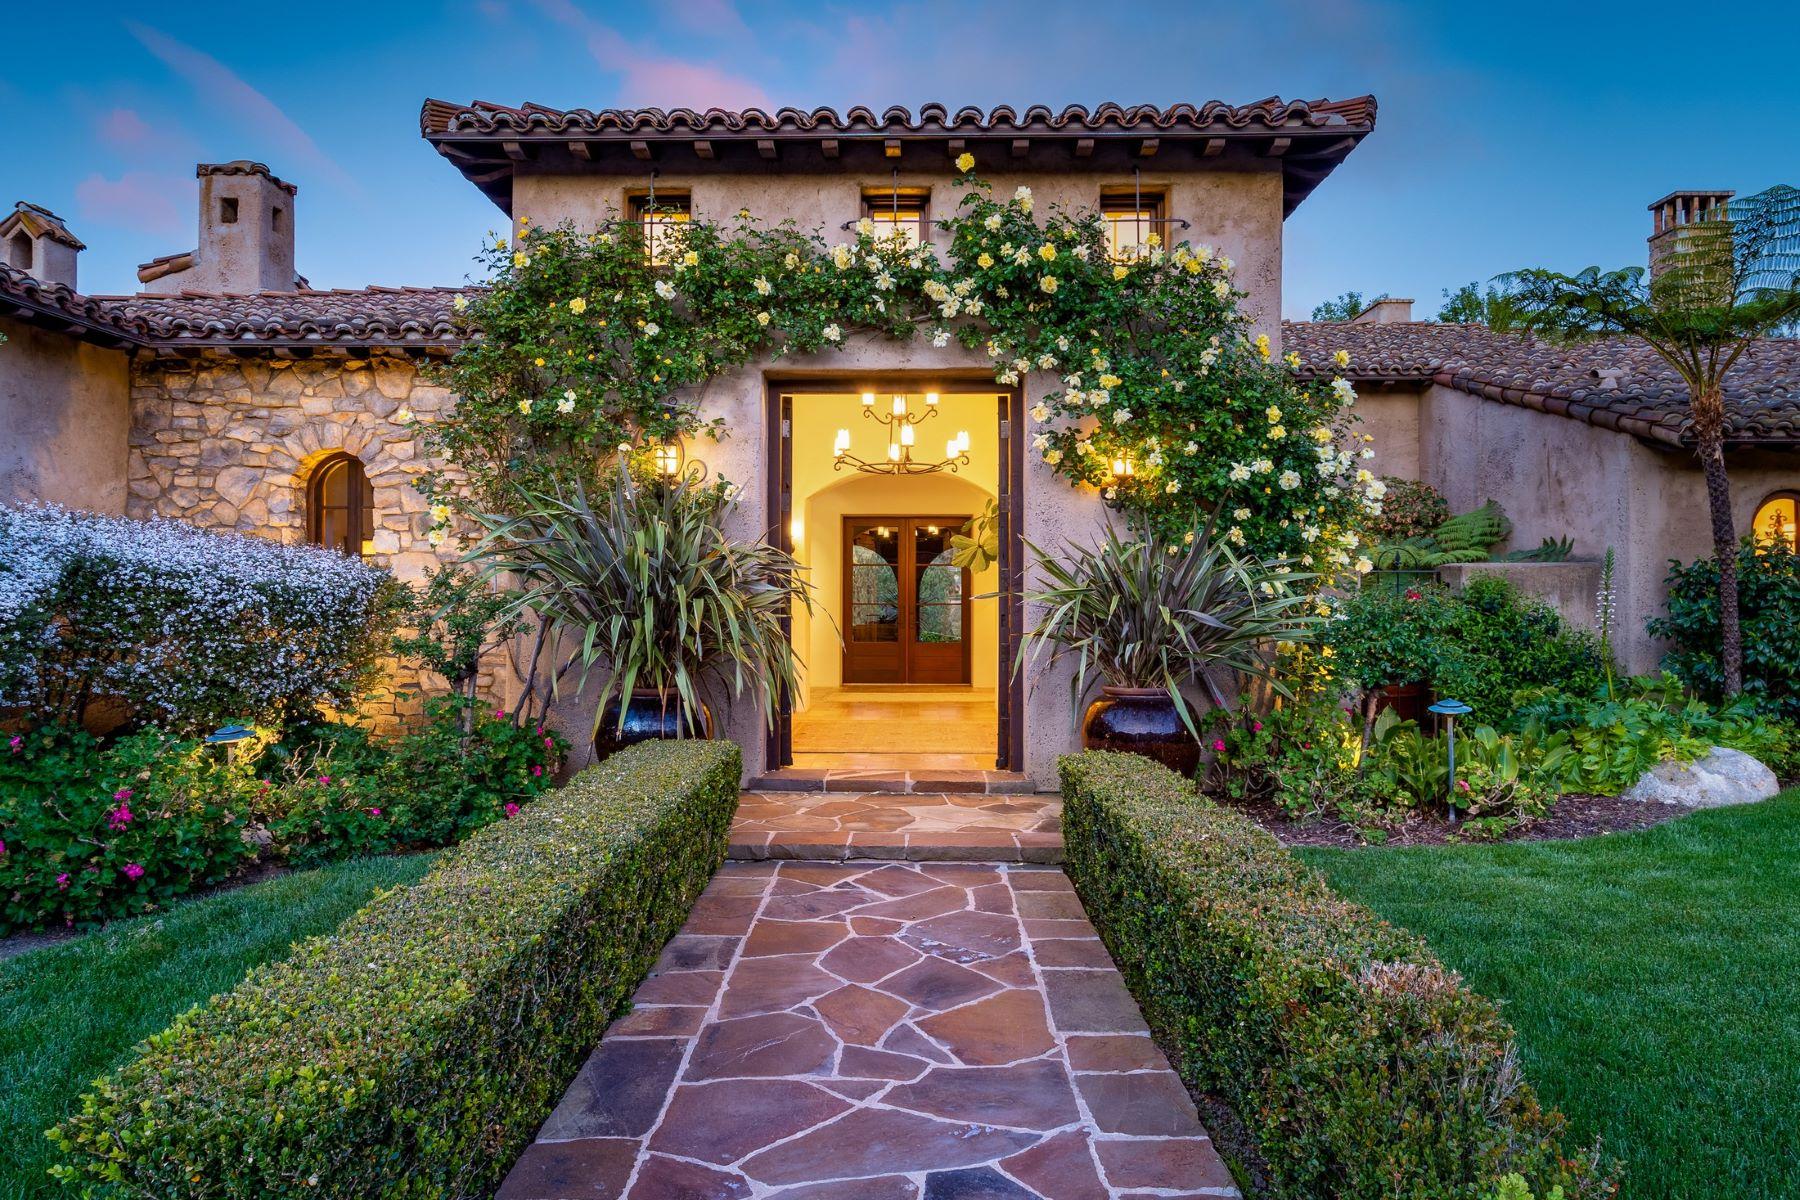 Single Family Homes for Active at Live in Celebration 5570 San Elijo Rancho Santa Fe, California 92067 United States